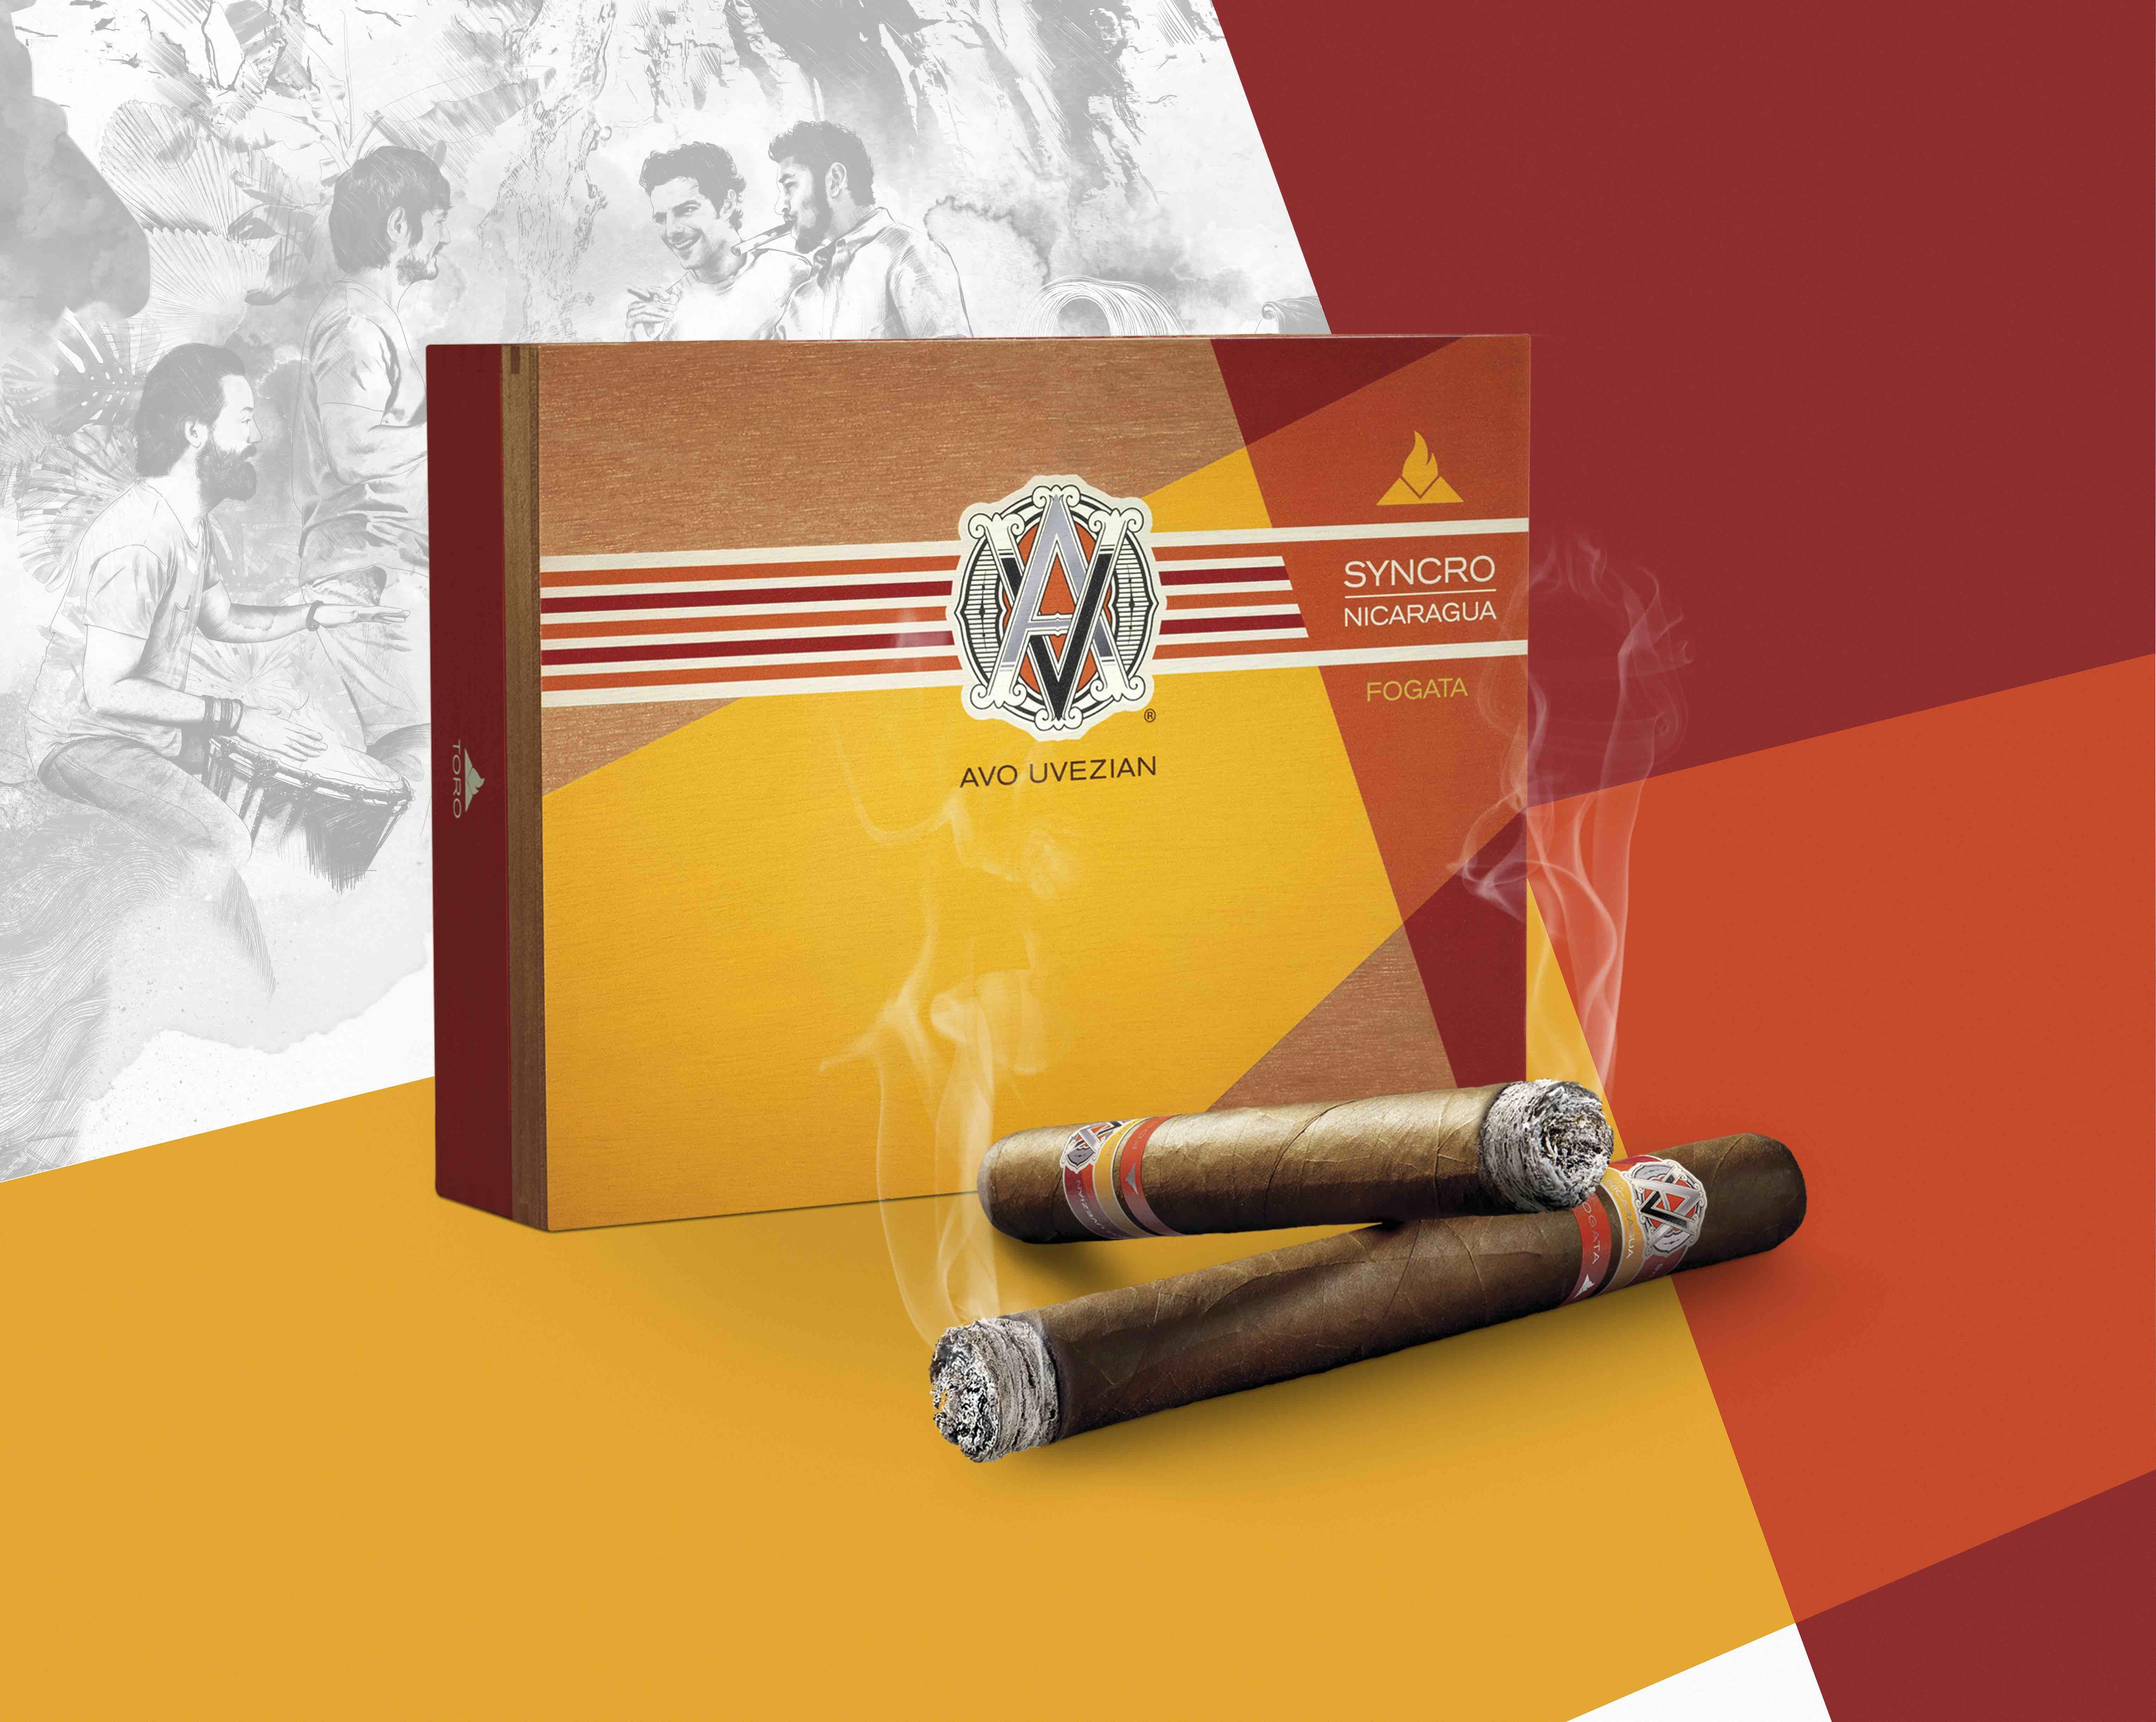 Cigar News: Avo Syncro Nicaragua Fogata Announced